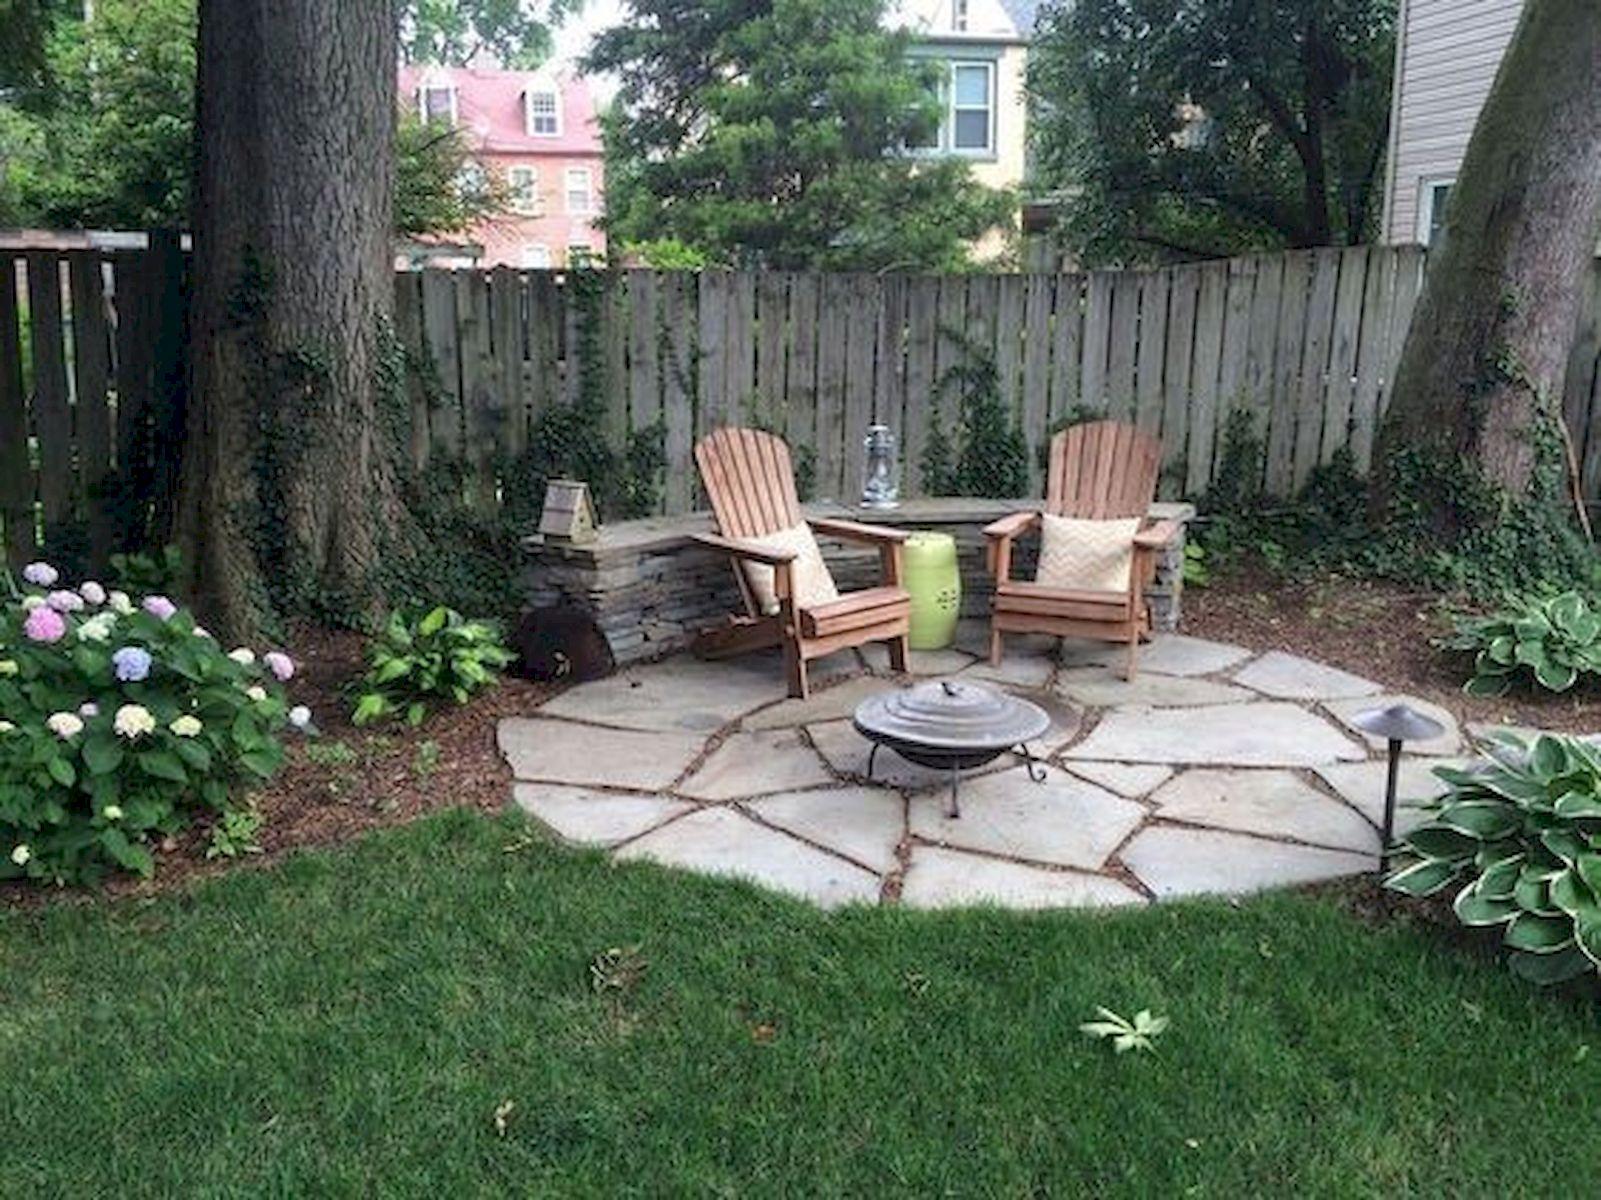 55 beautiful backyard patio ideas on a